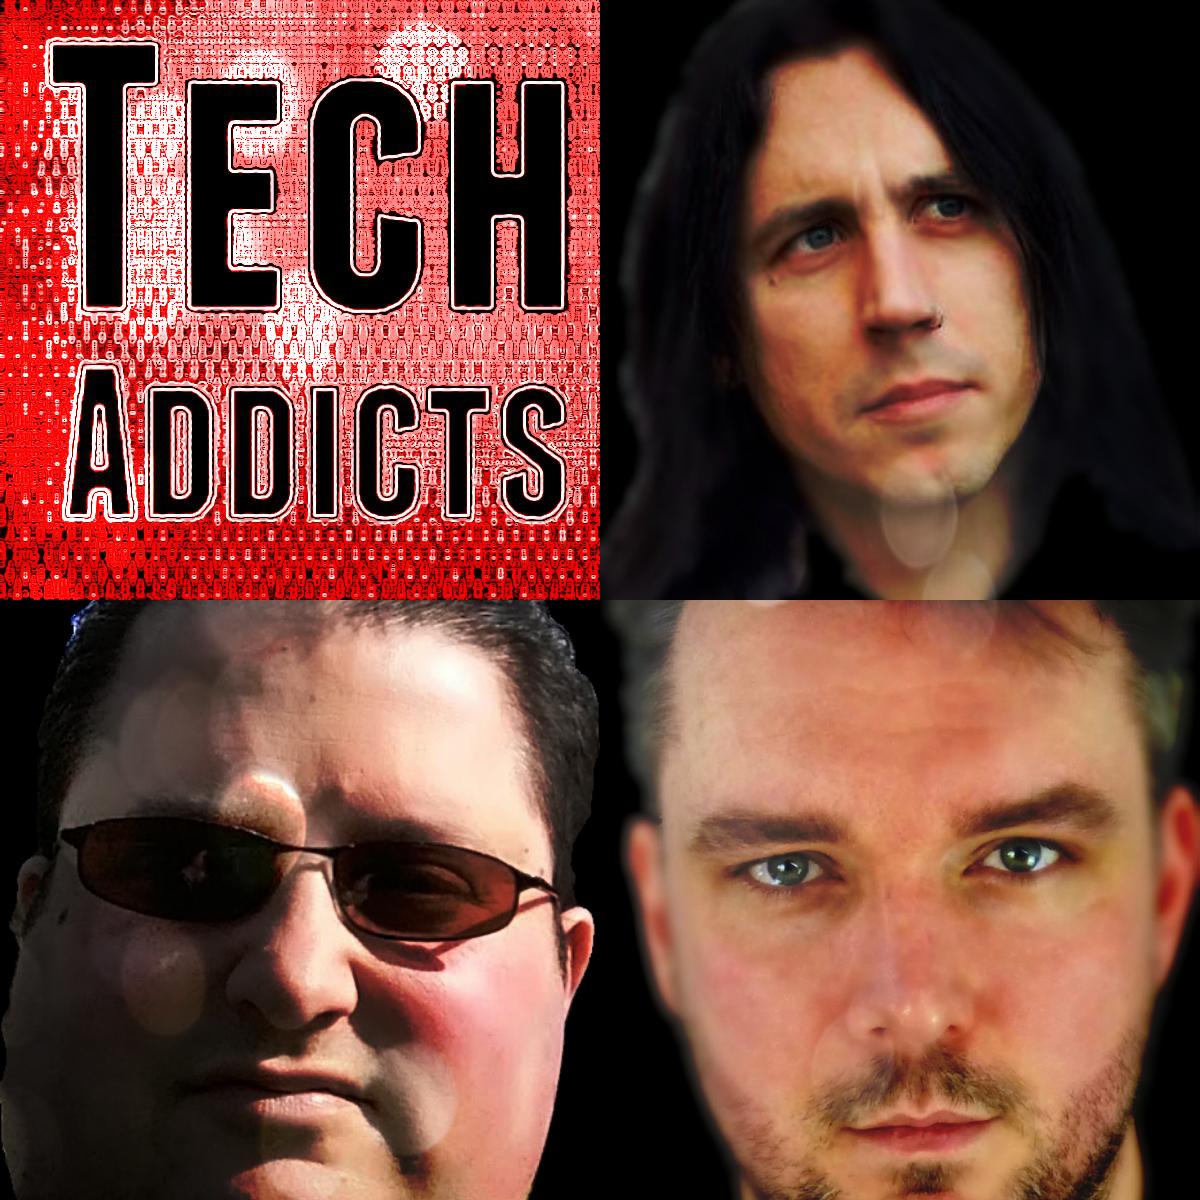 Tech Addicts UK Podcast - 16th November 2016